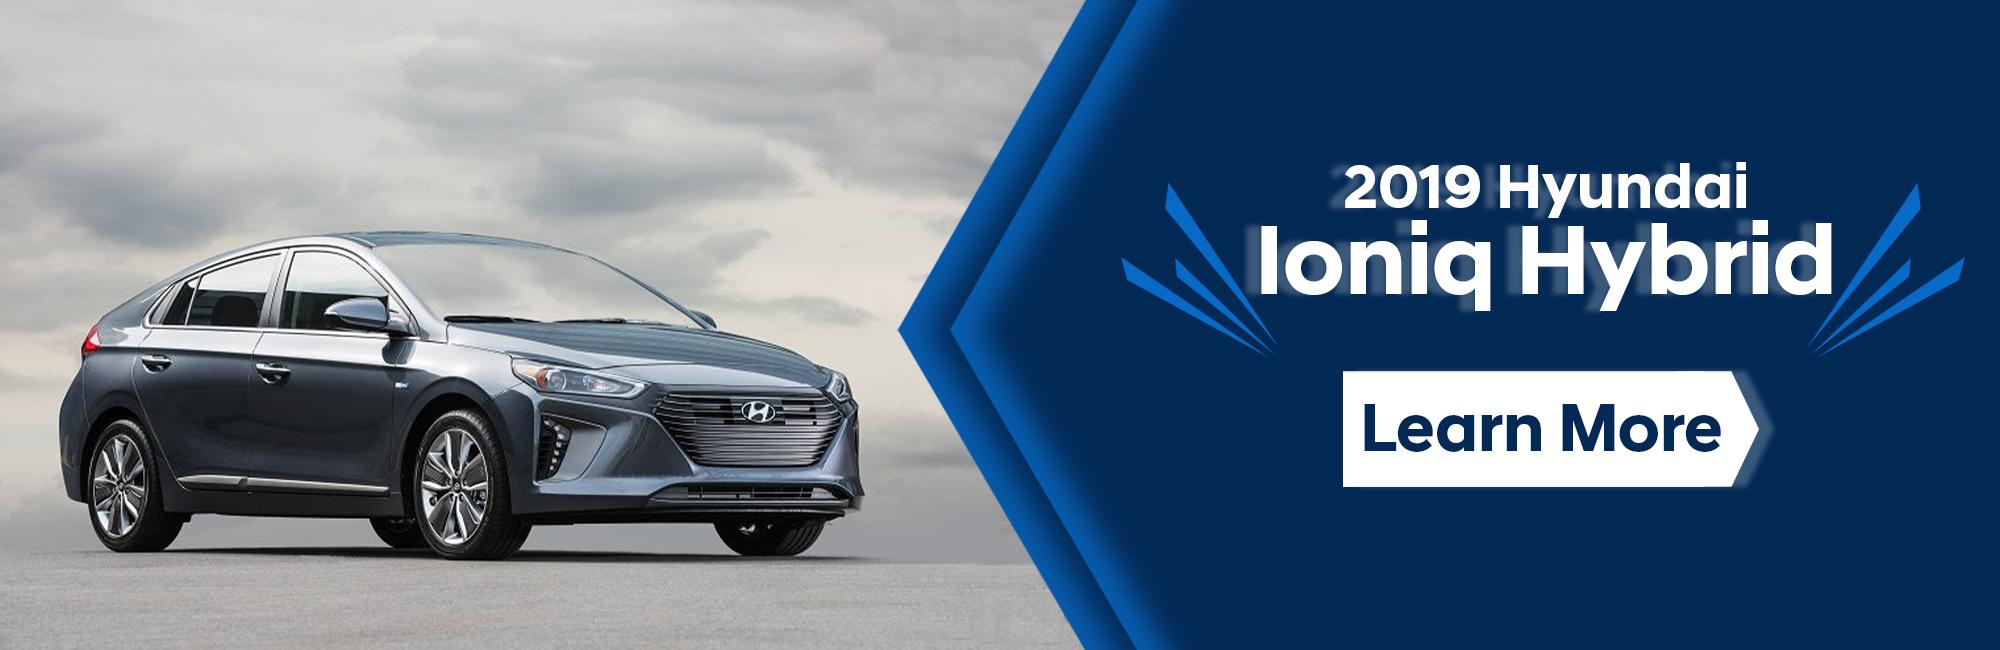 2019 Hyundai Iconiq Hybrid